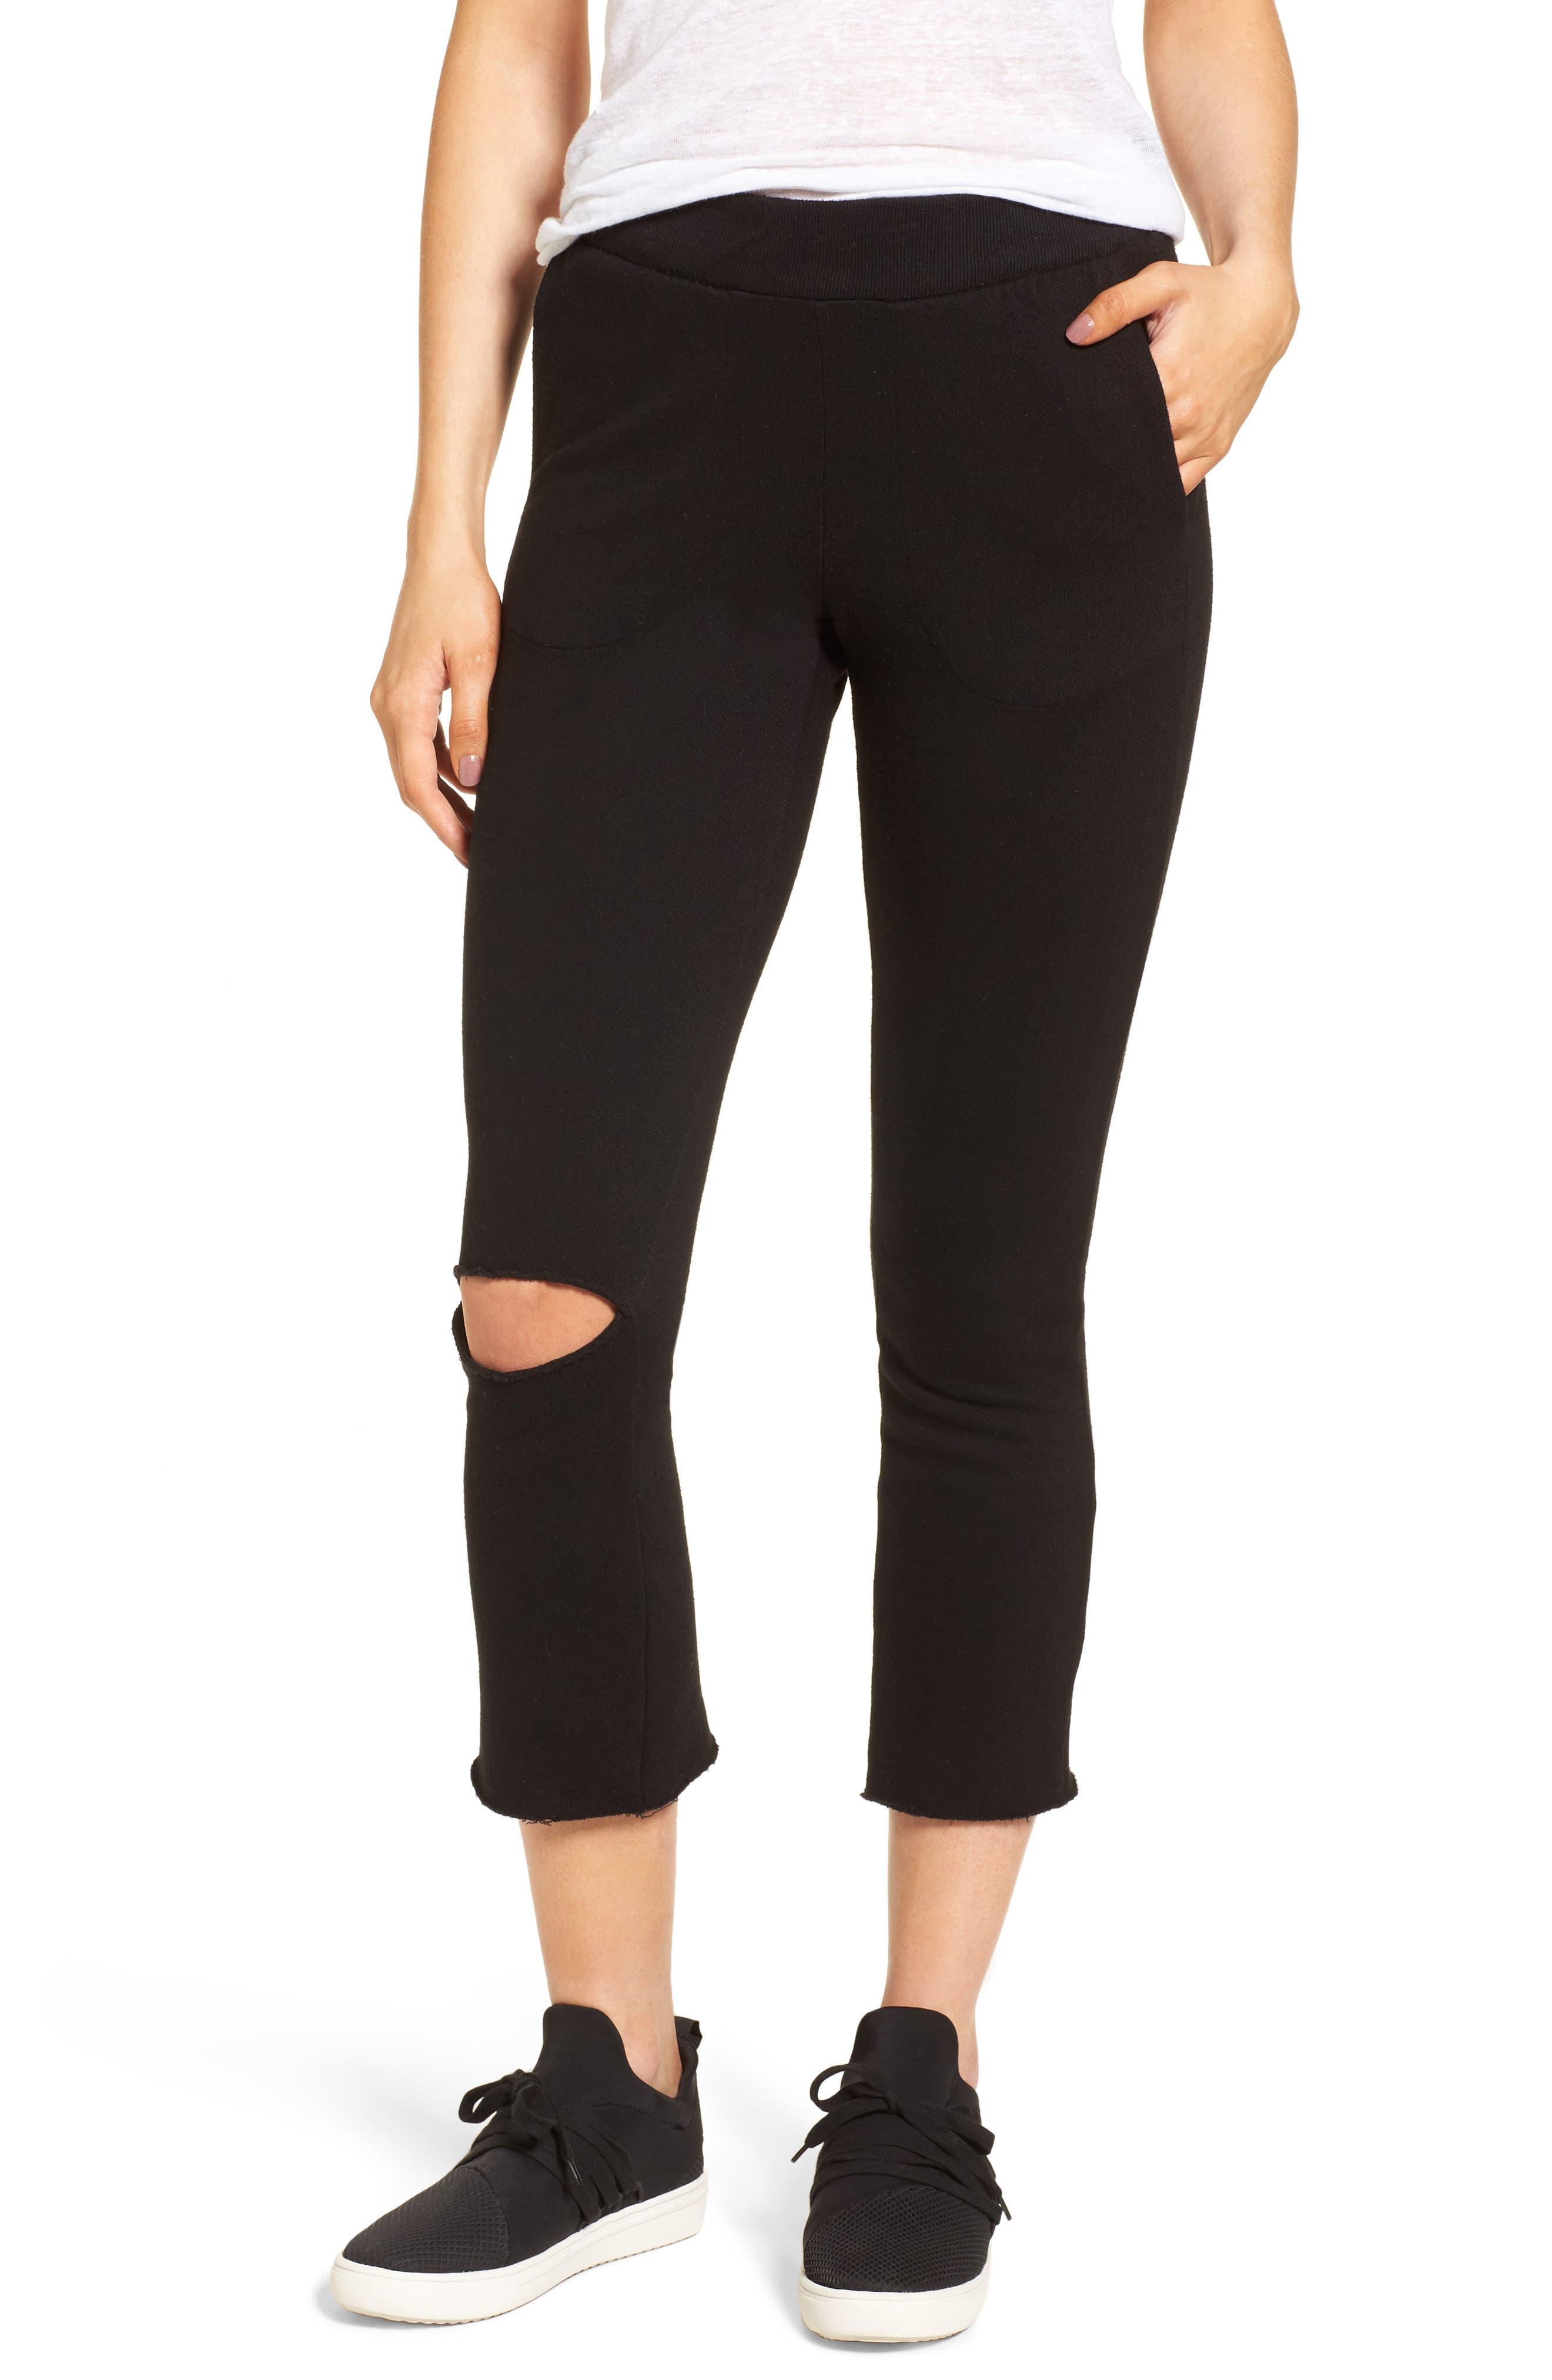 Malibu Slit Knee Sweatpants,                         Main,                         color, Black Cat